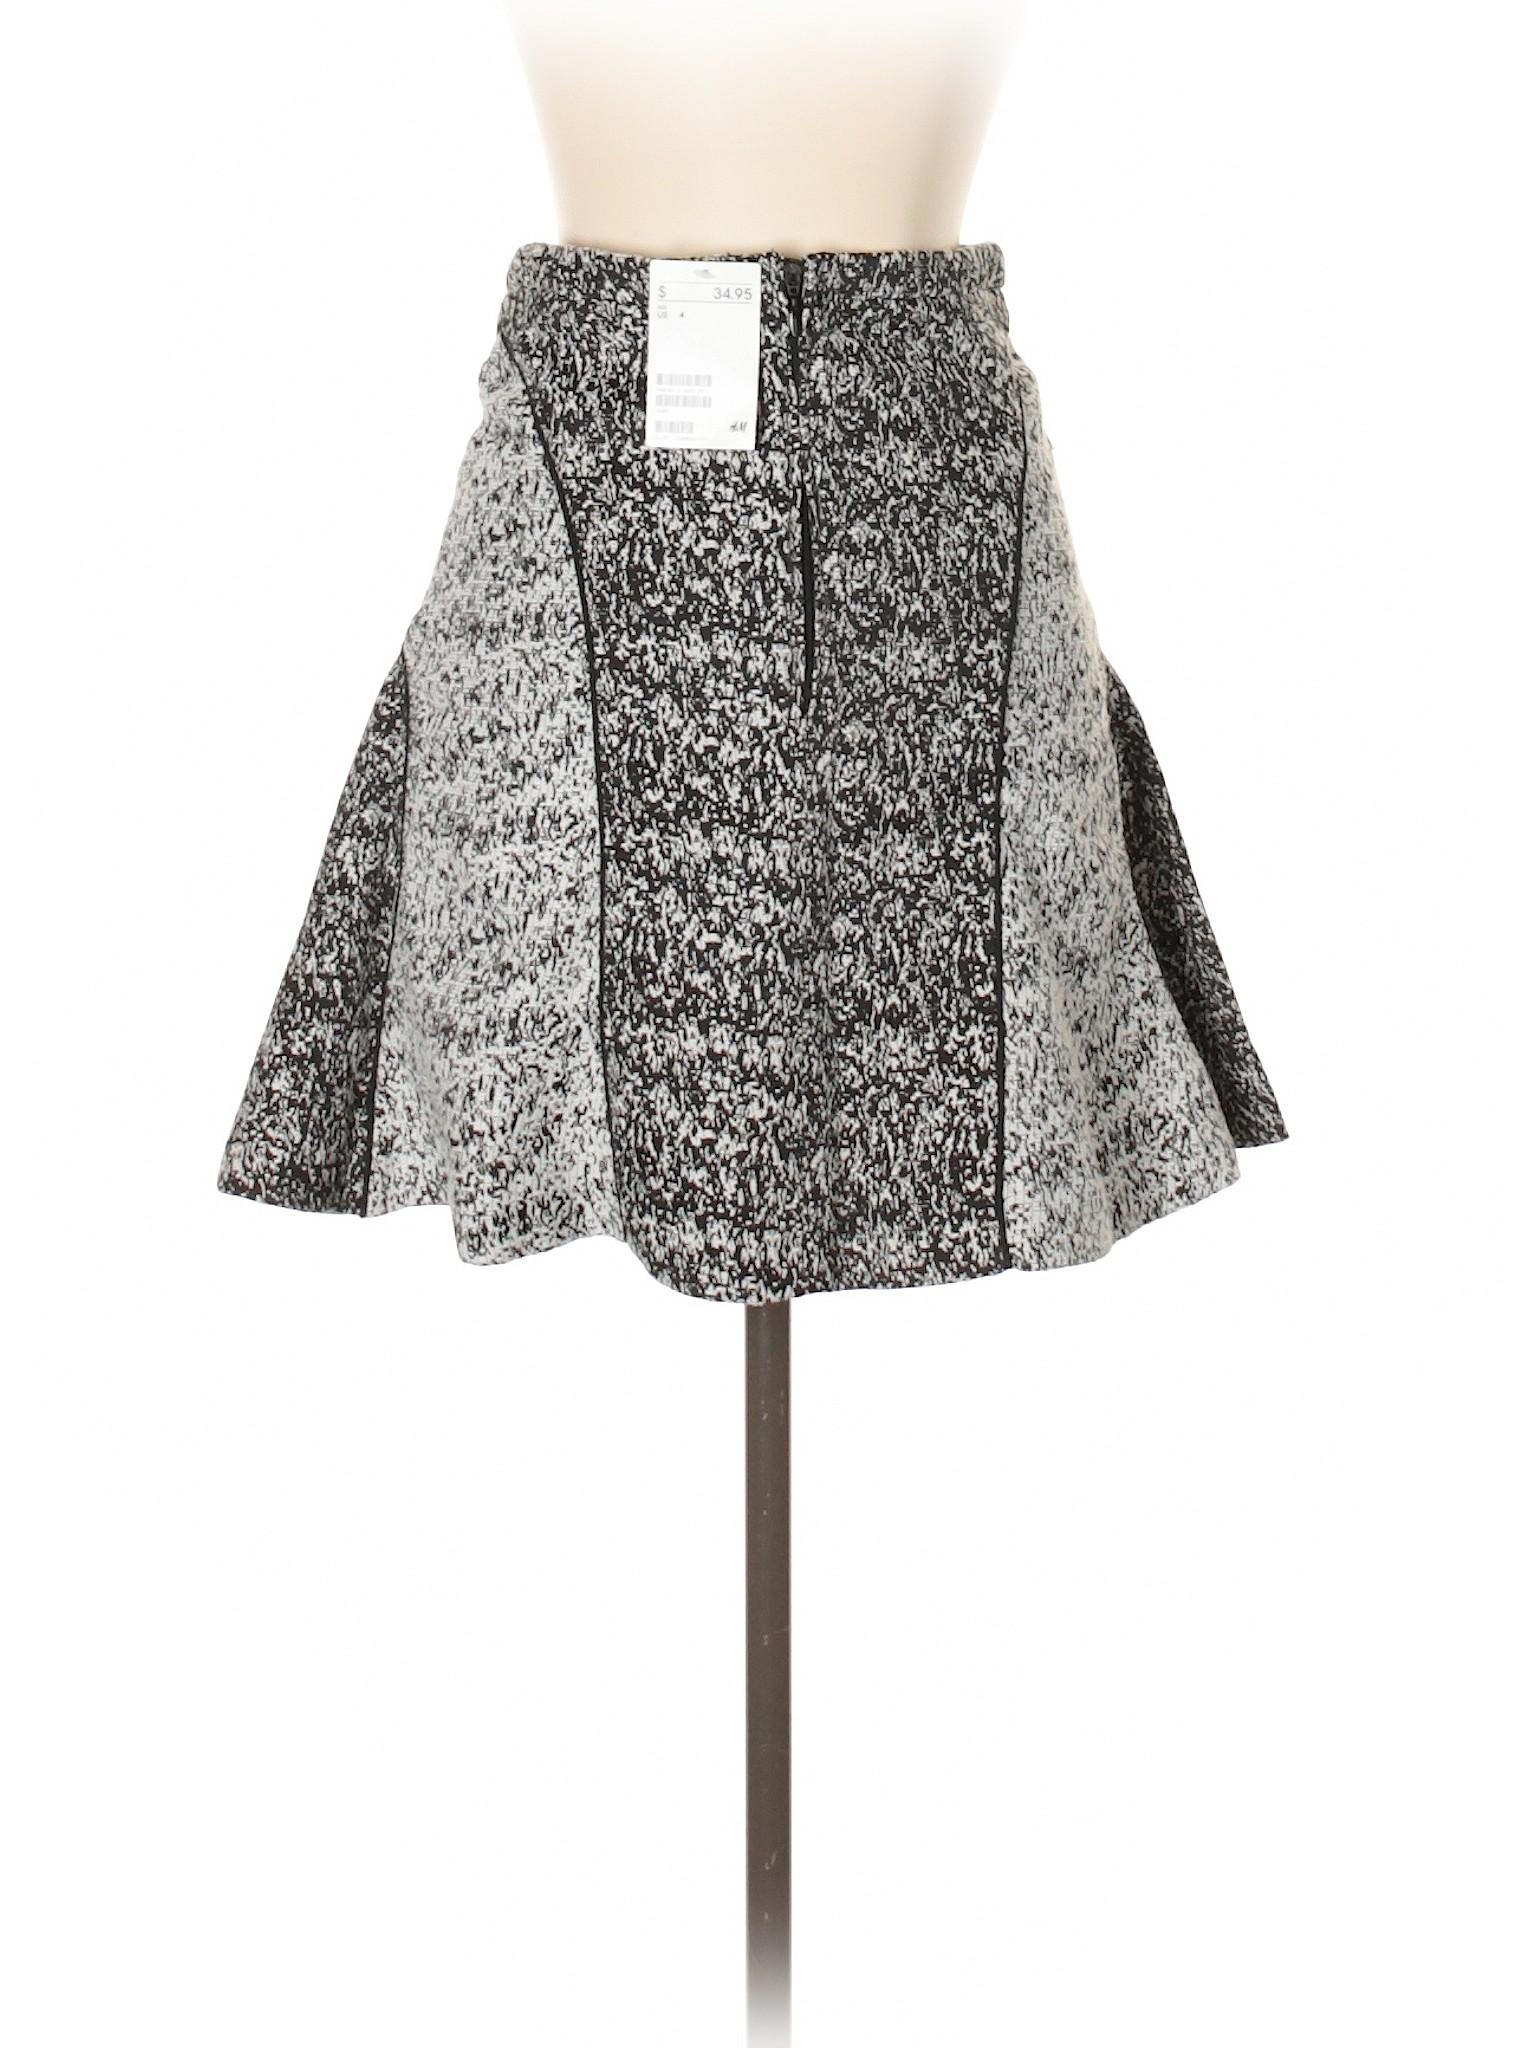 Casual Winter amp;m Skirt H Leisure CwnUaq6x